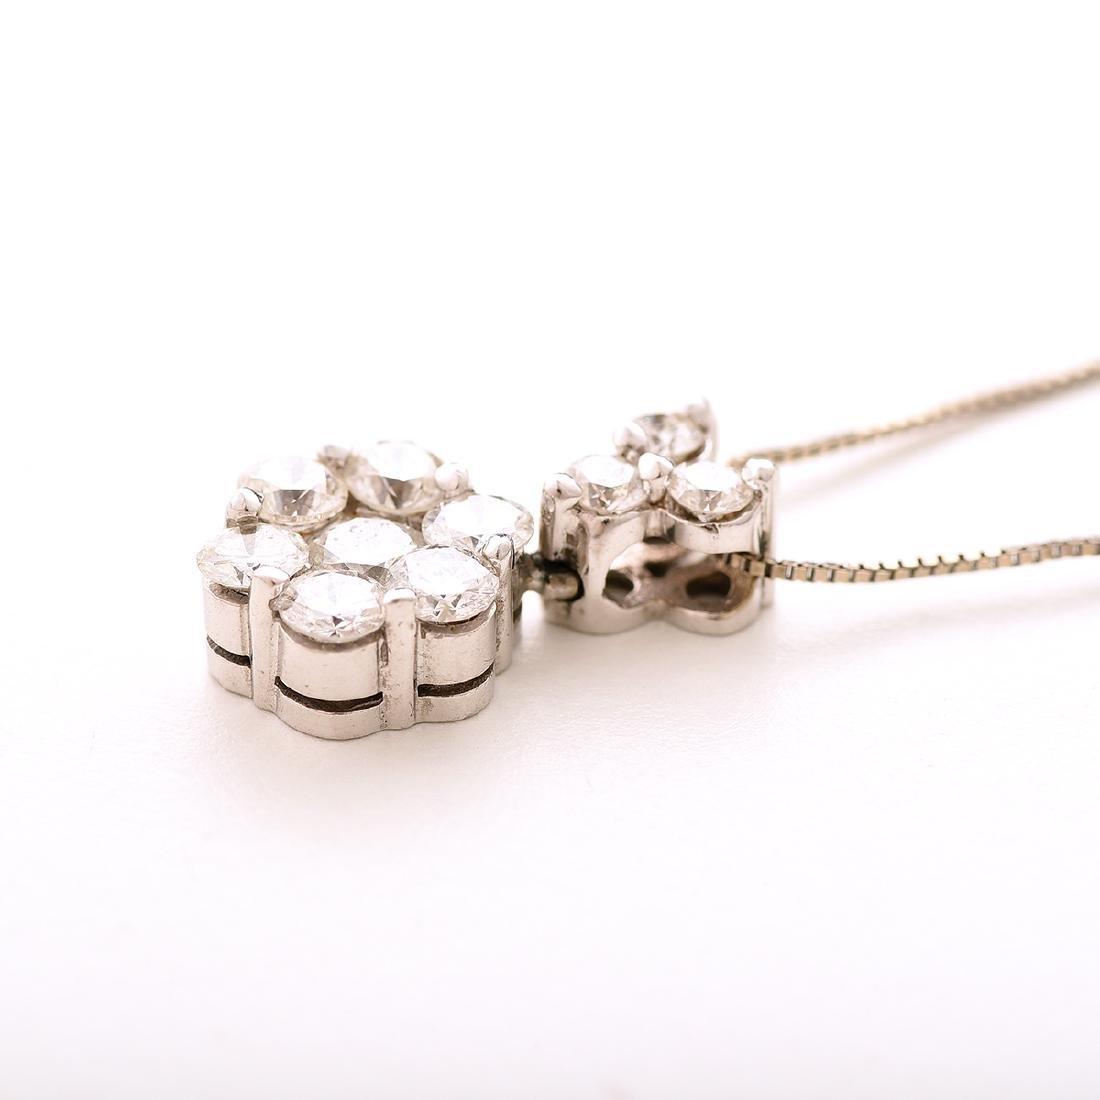 Diamond, 14k White Gold Pendant Necklace. - 2